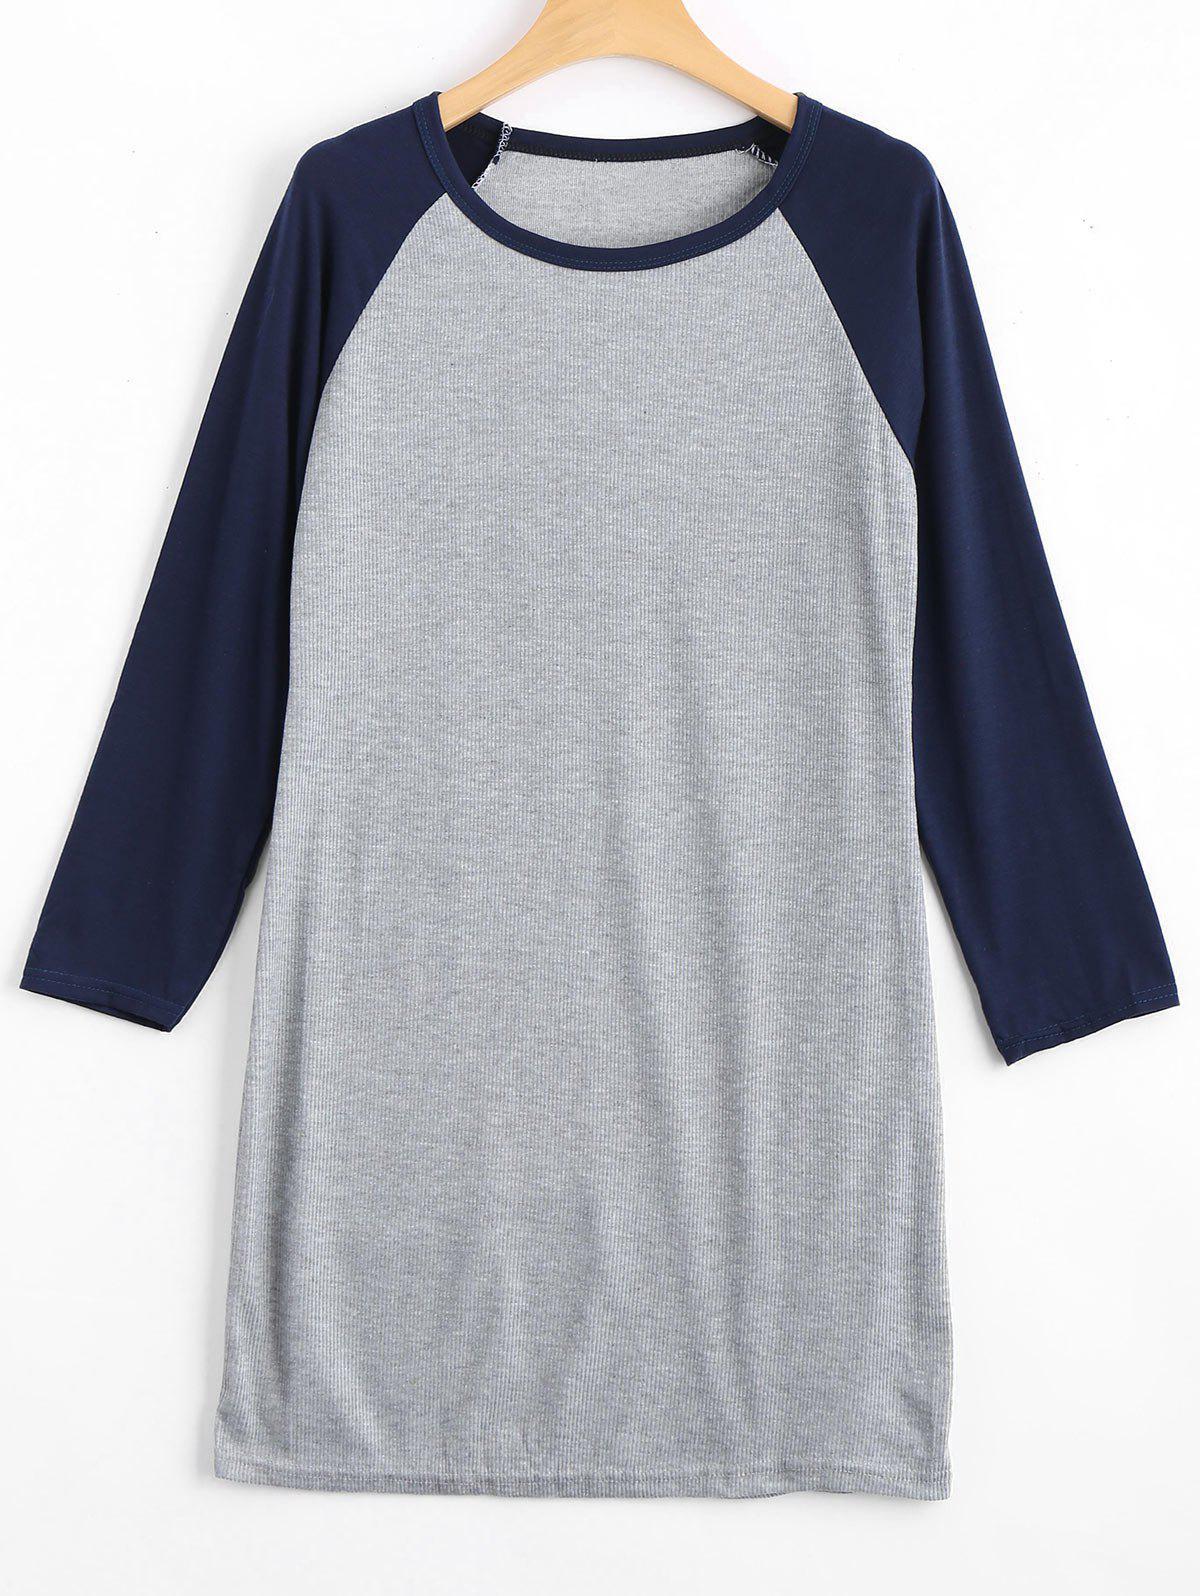 Raglan Sleeve Ribbed Knitted Dress 222153505